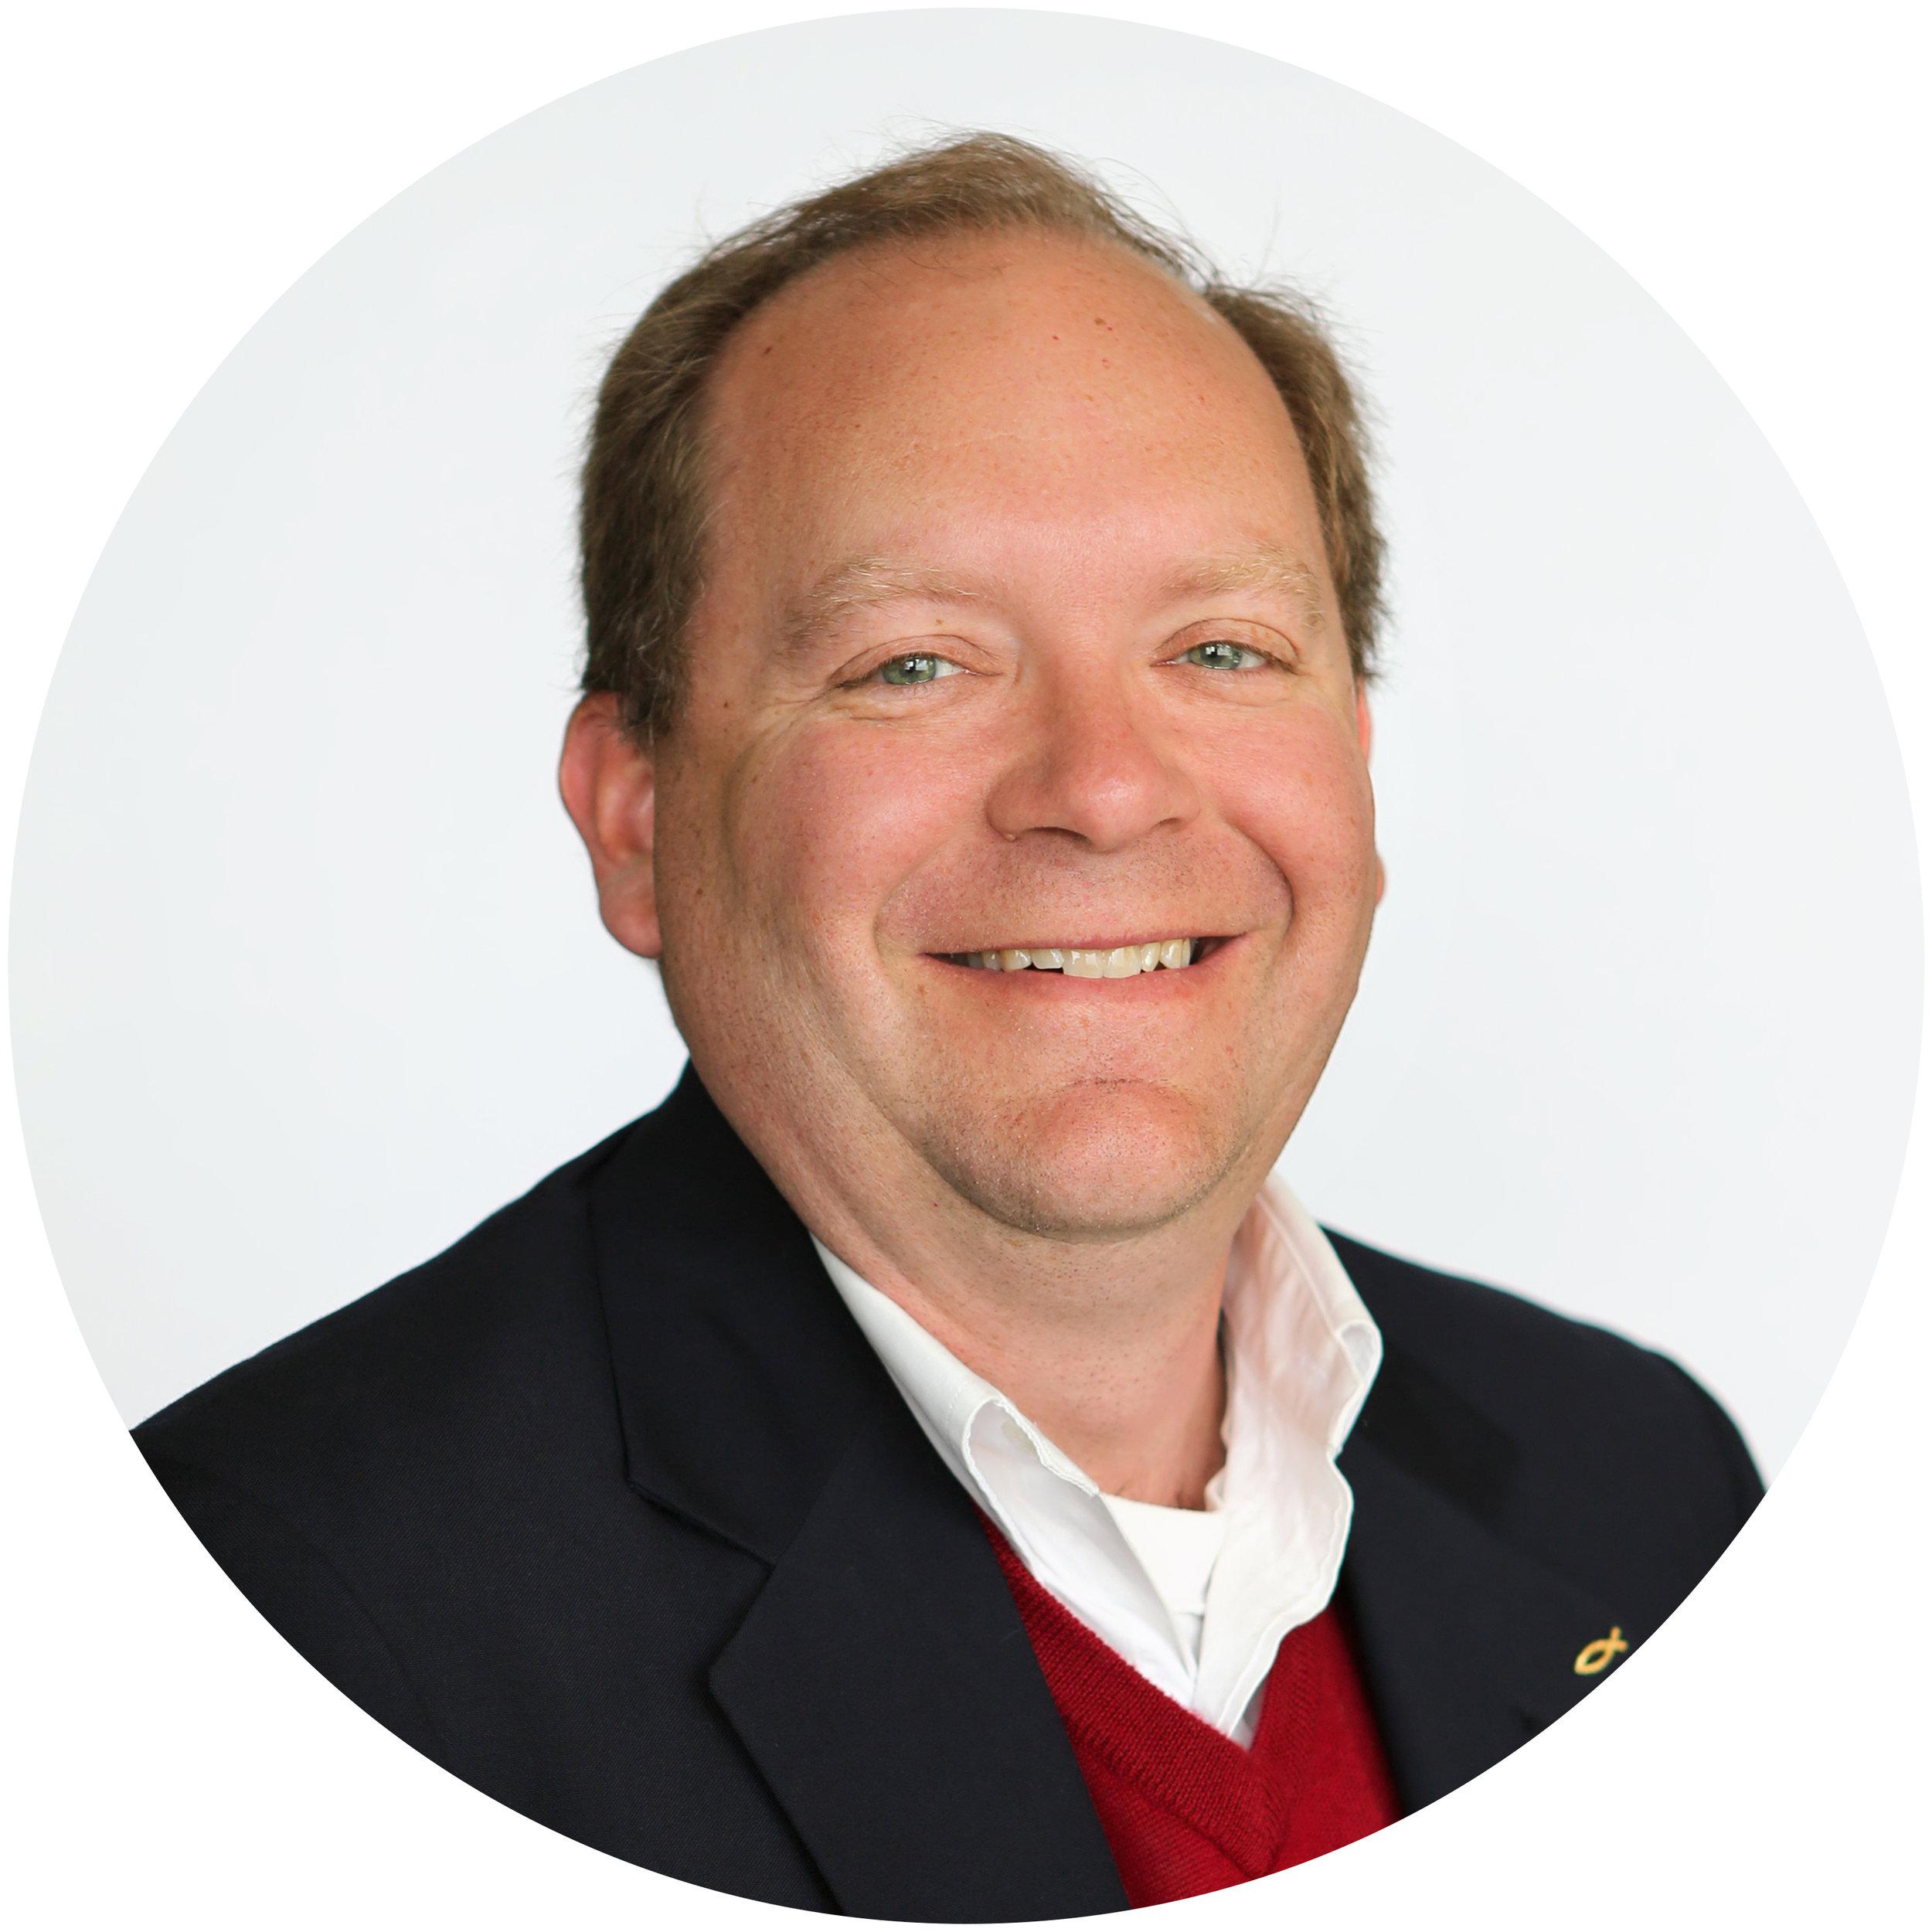 Mack Overton, Vice President, EHS Compliance Services, KERAMIDA Inc.